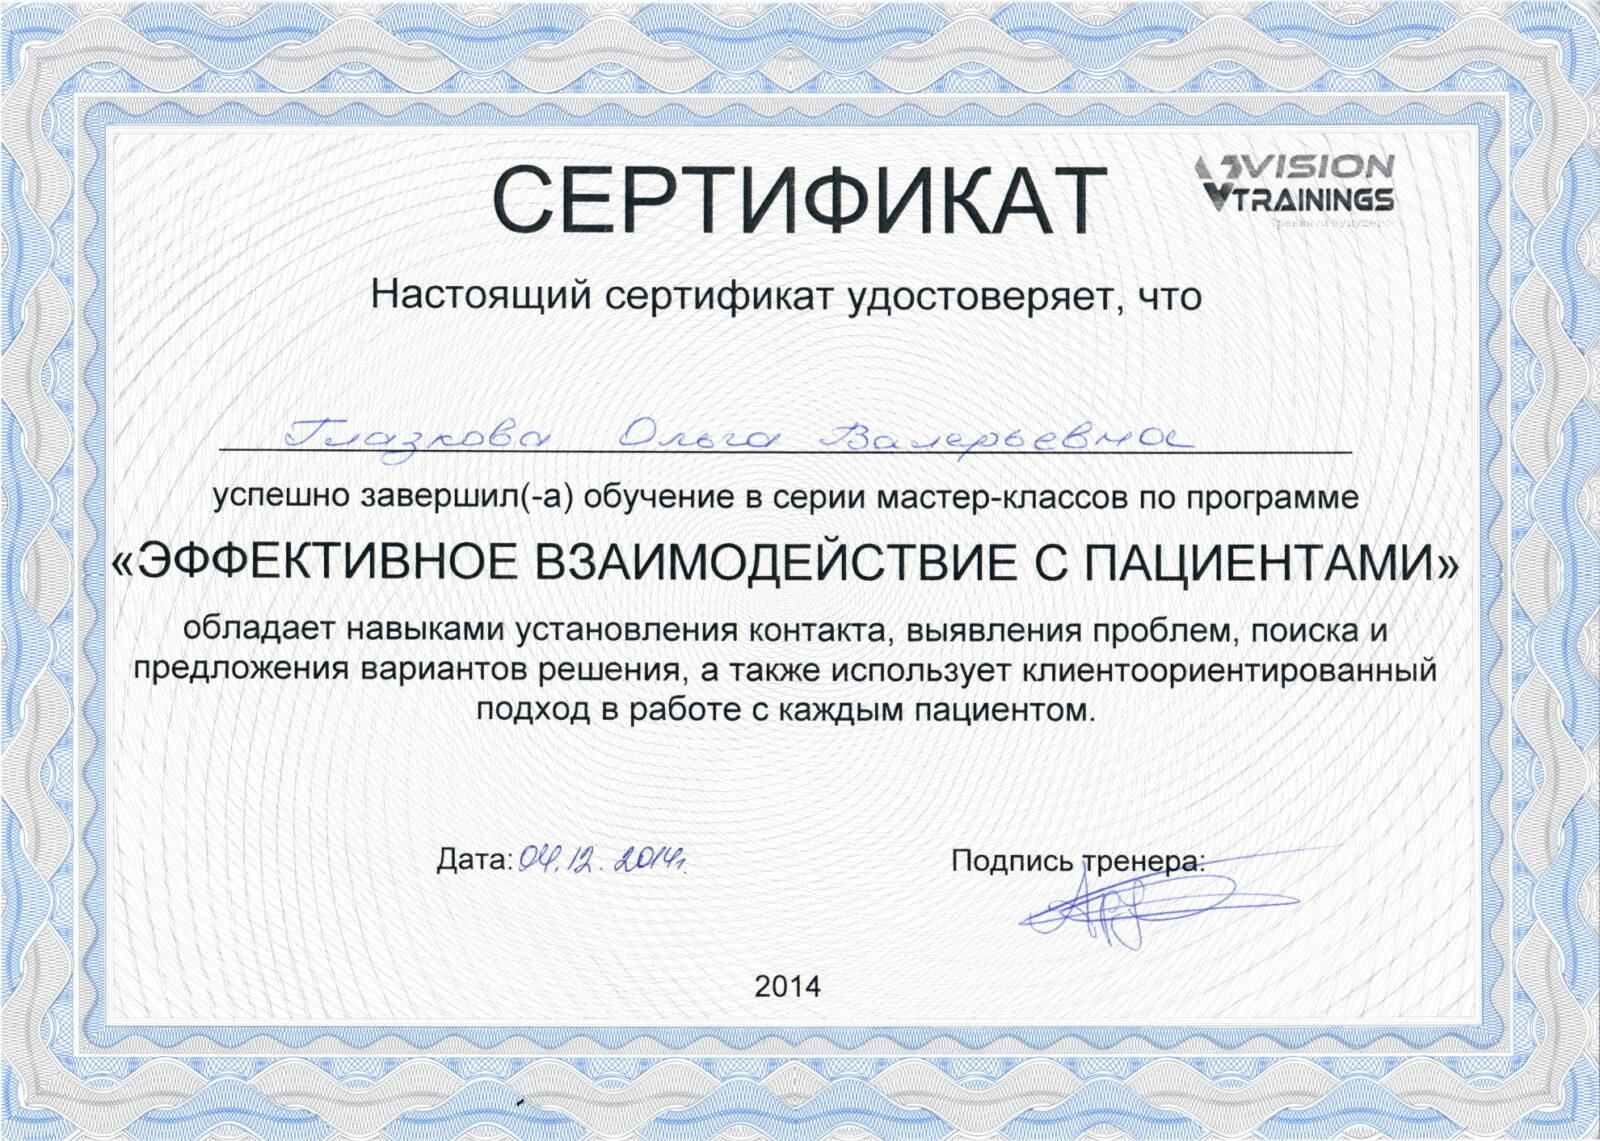 2014.12.04 Сертификат